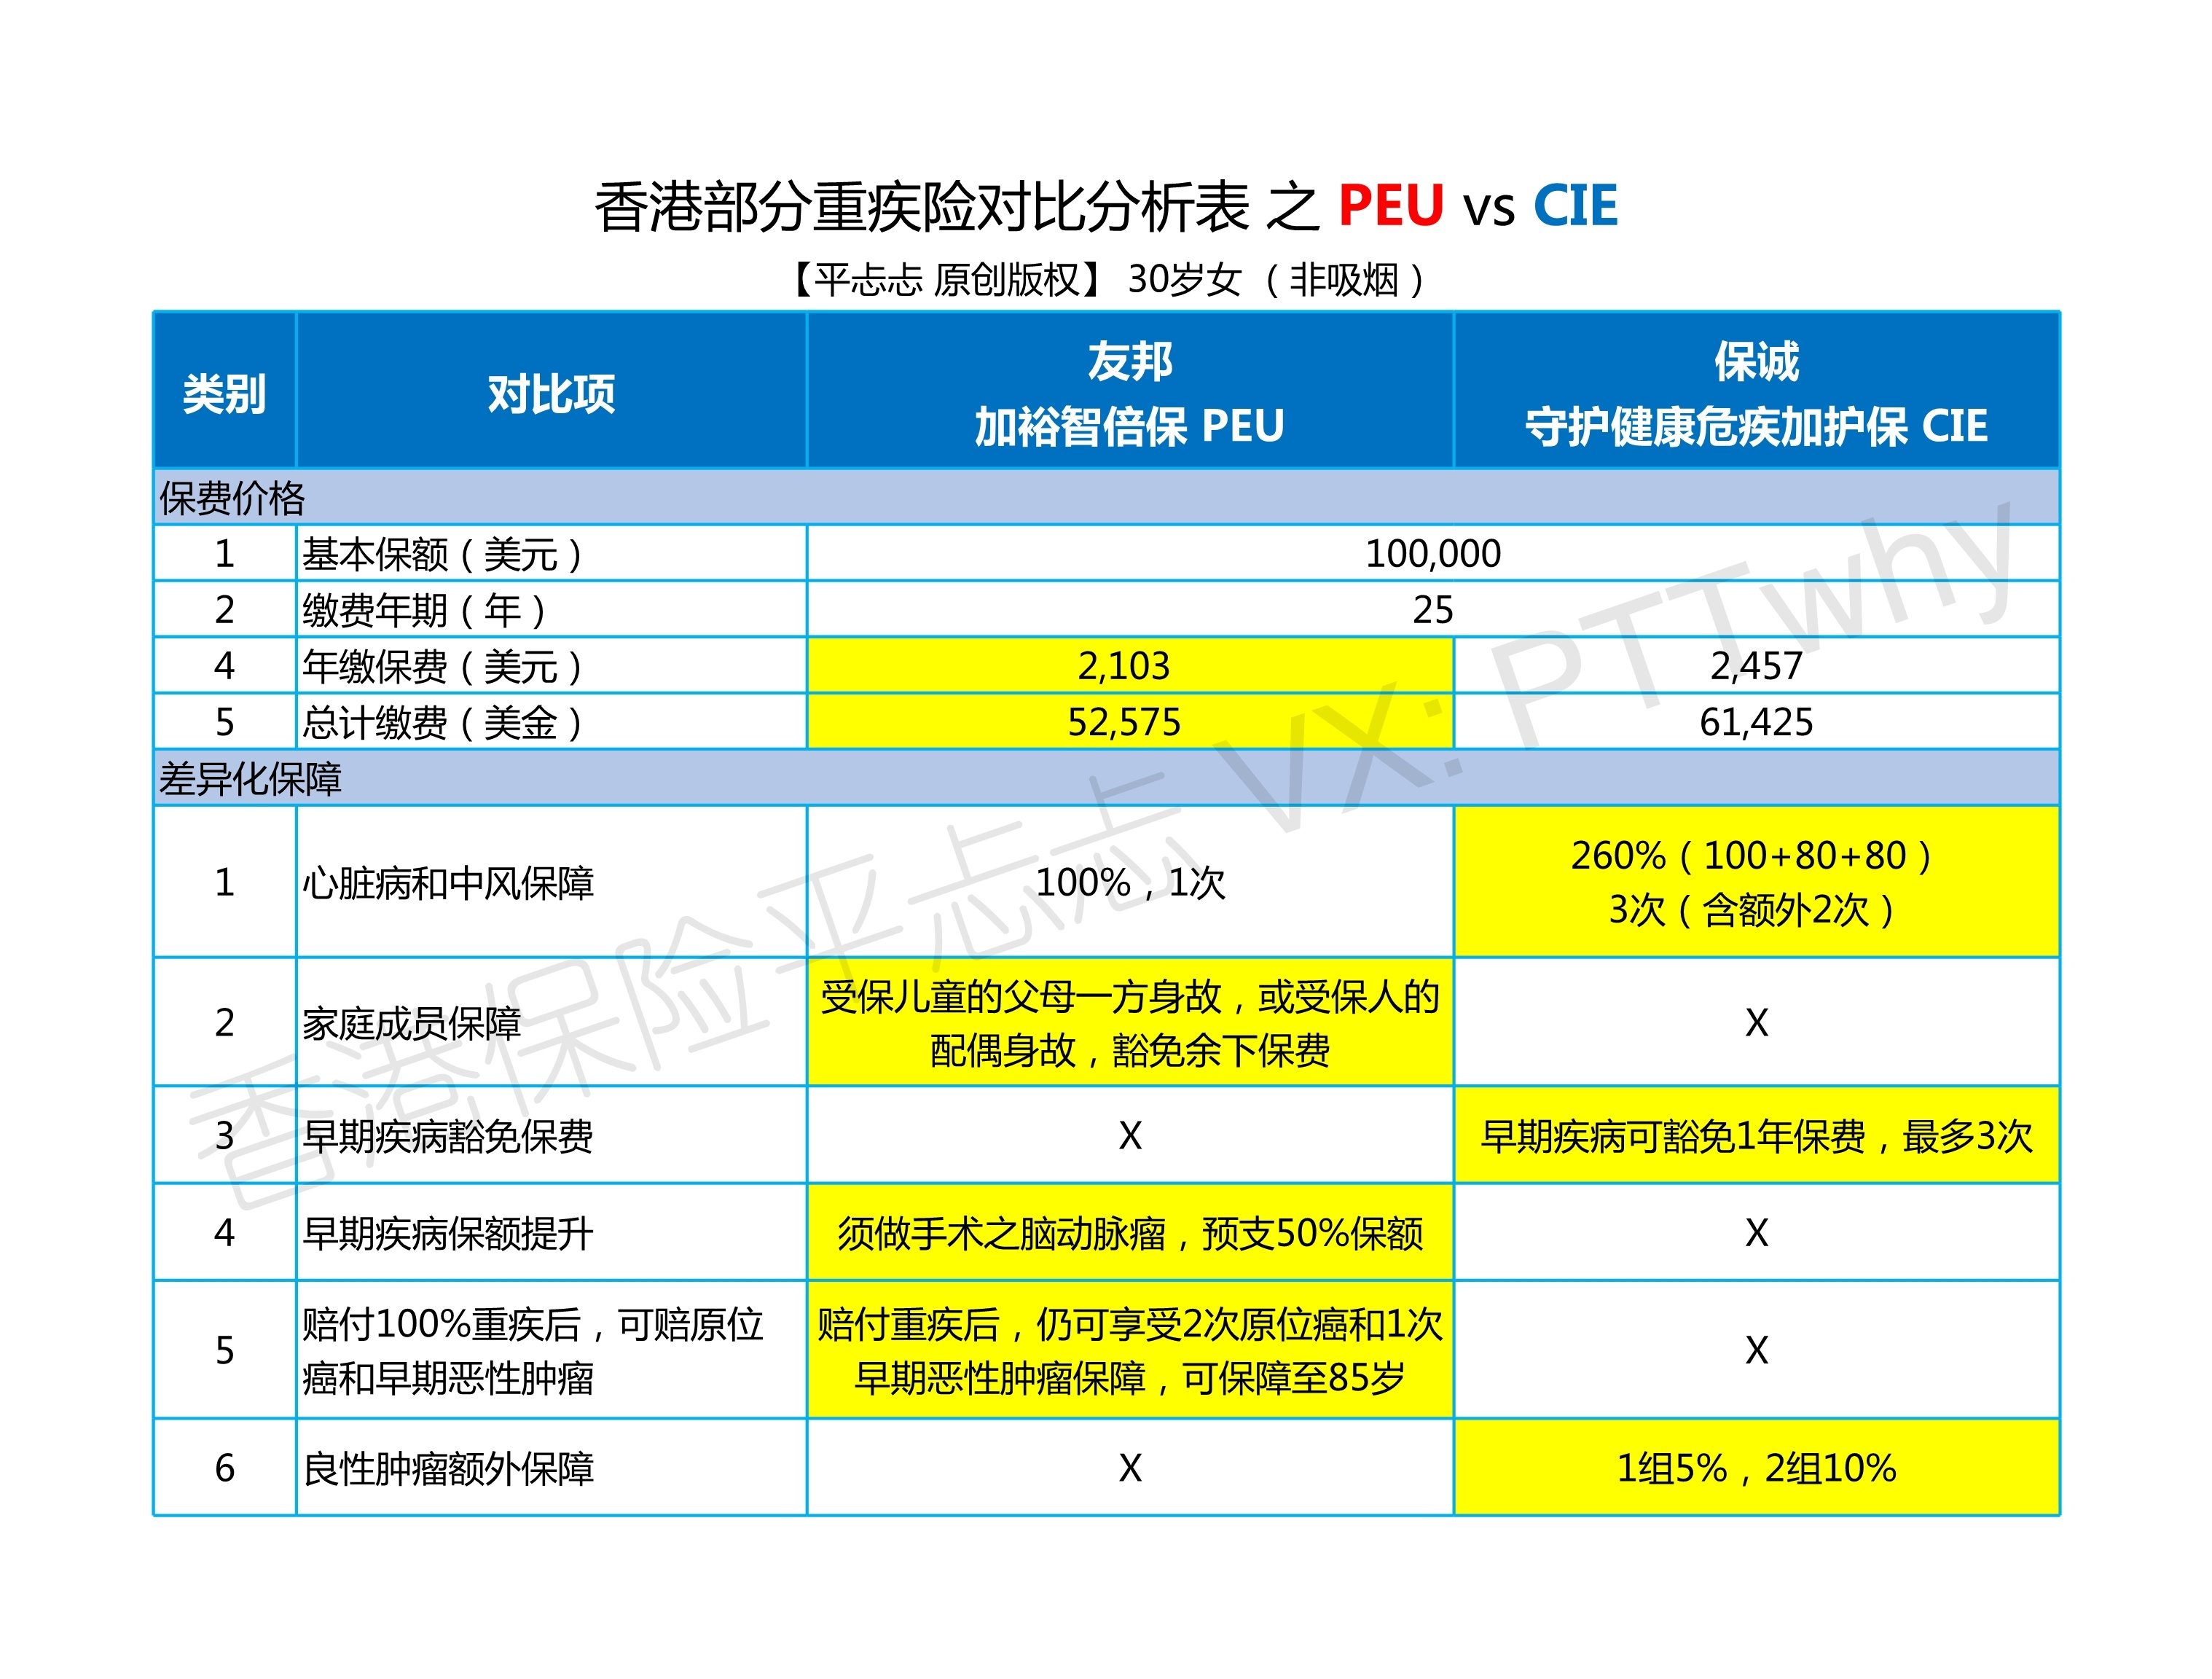 R5(終結篇)友邦加裕智倍保PEU,保誠守護健康危疾加護保CIE哪個更劃算? - 知乎